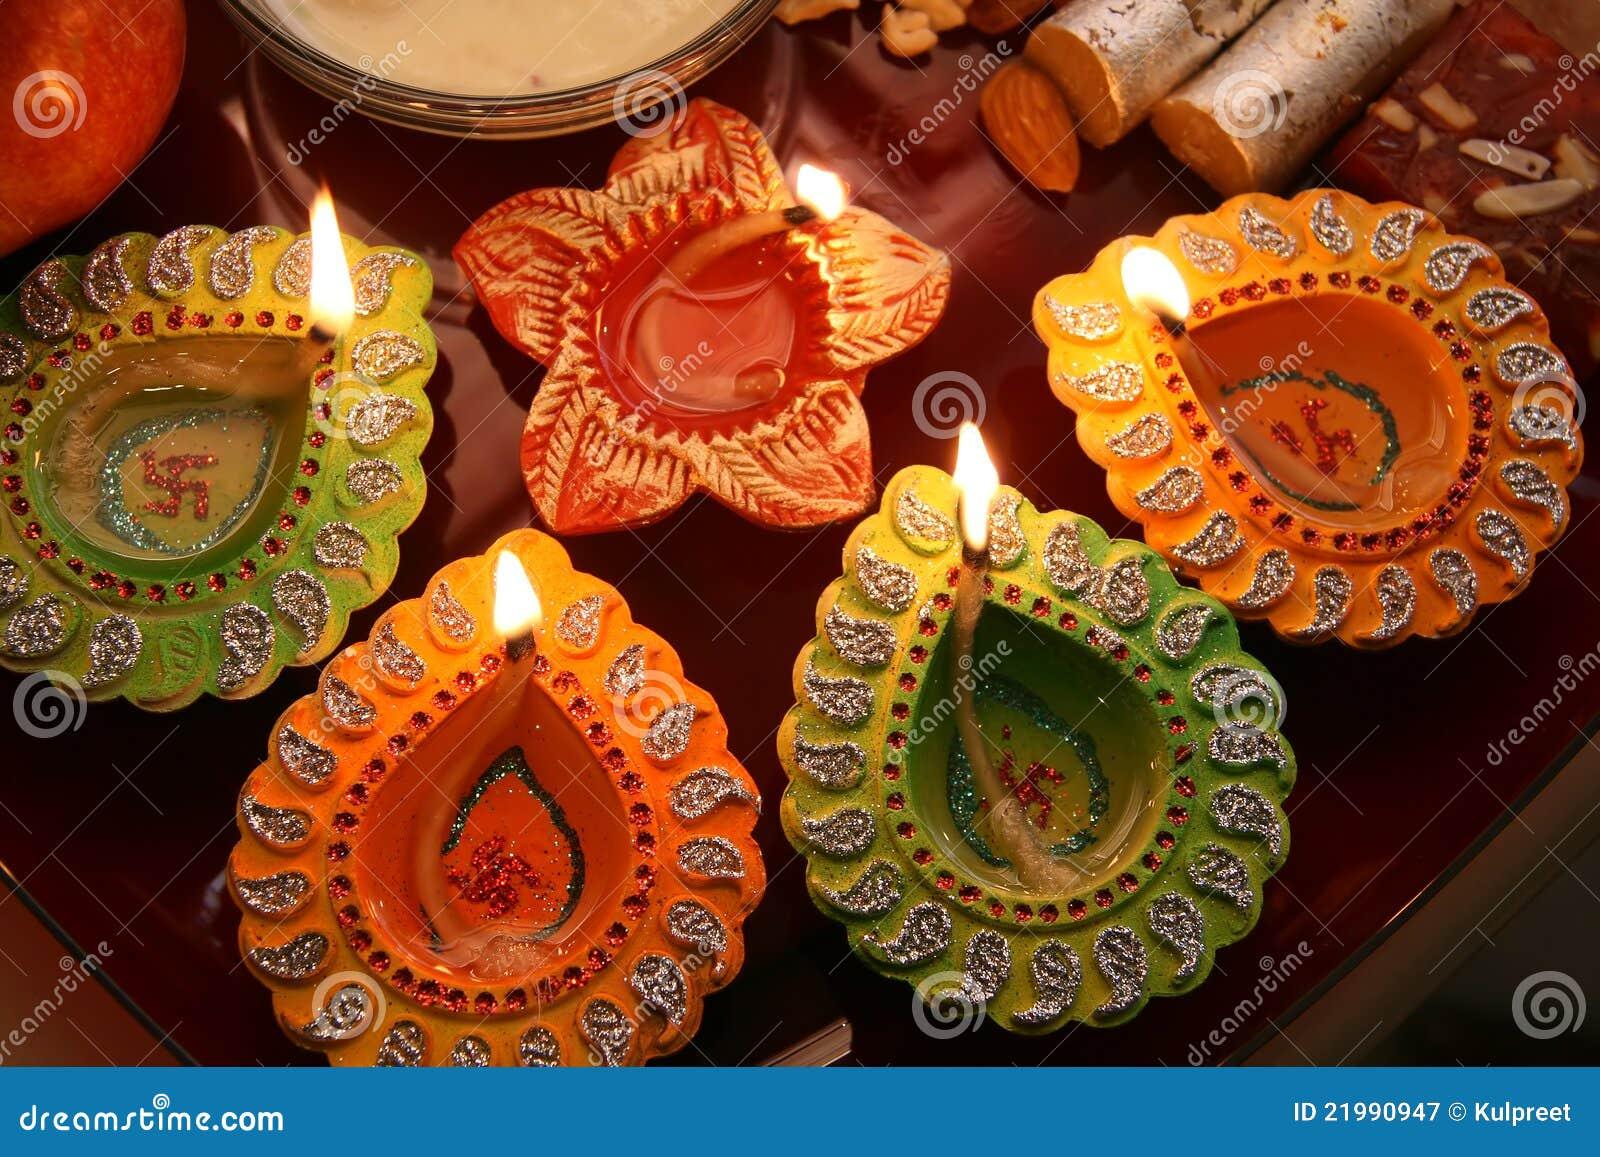 Thali de Diwali con diya adornado